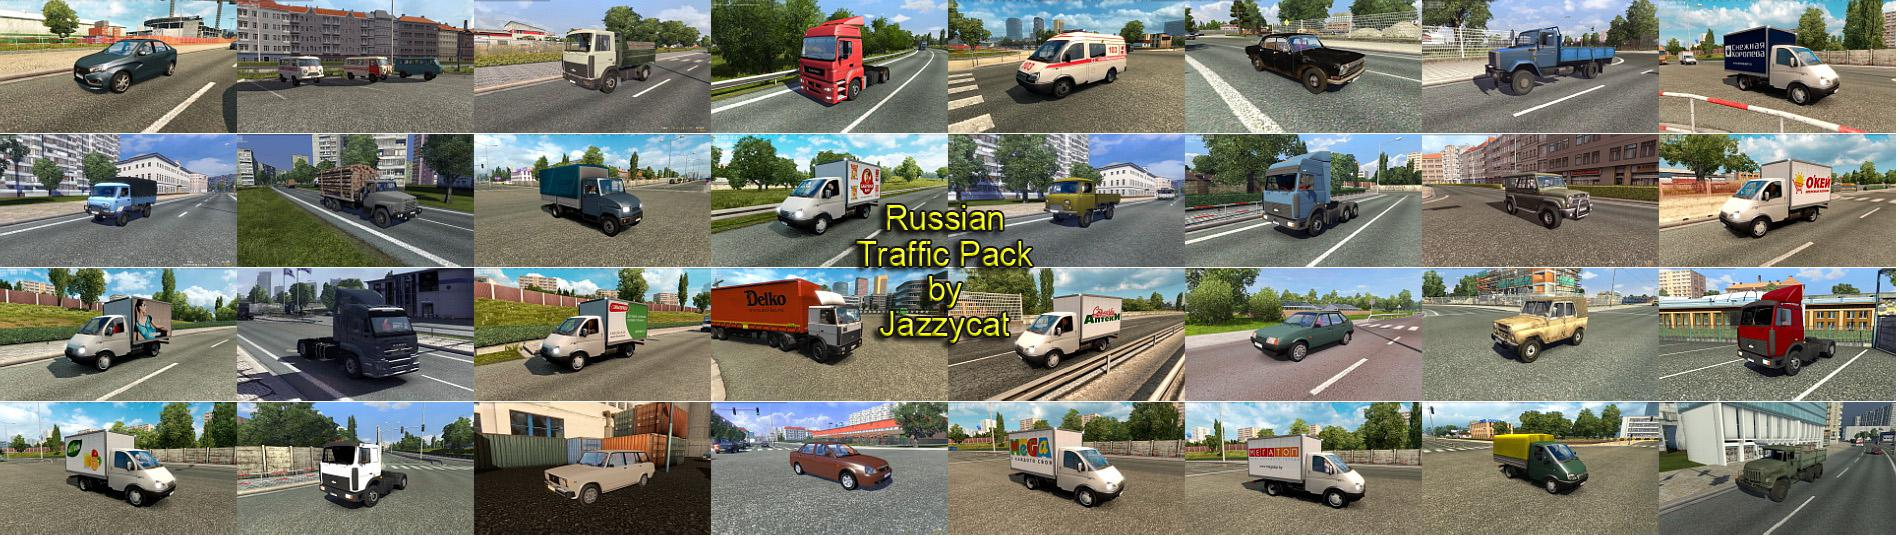 ETS2 - Russian Traffic Pack V2.8.1 (1.36.x)